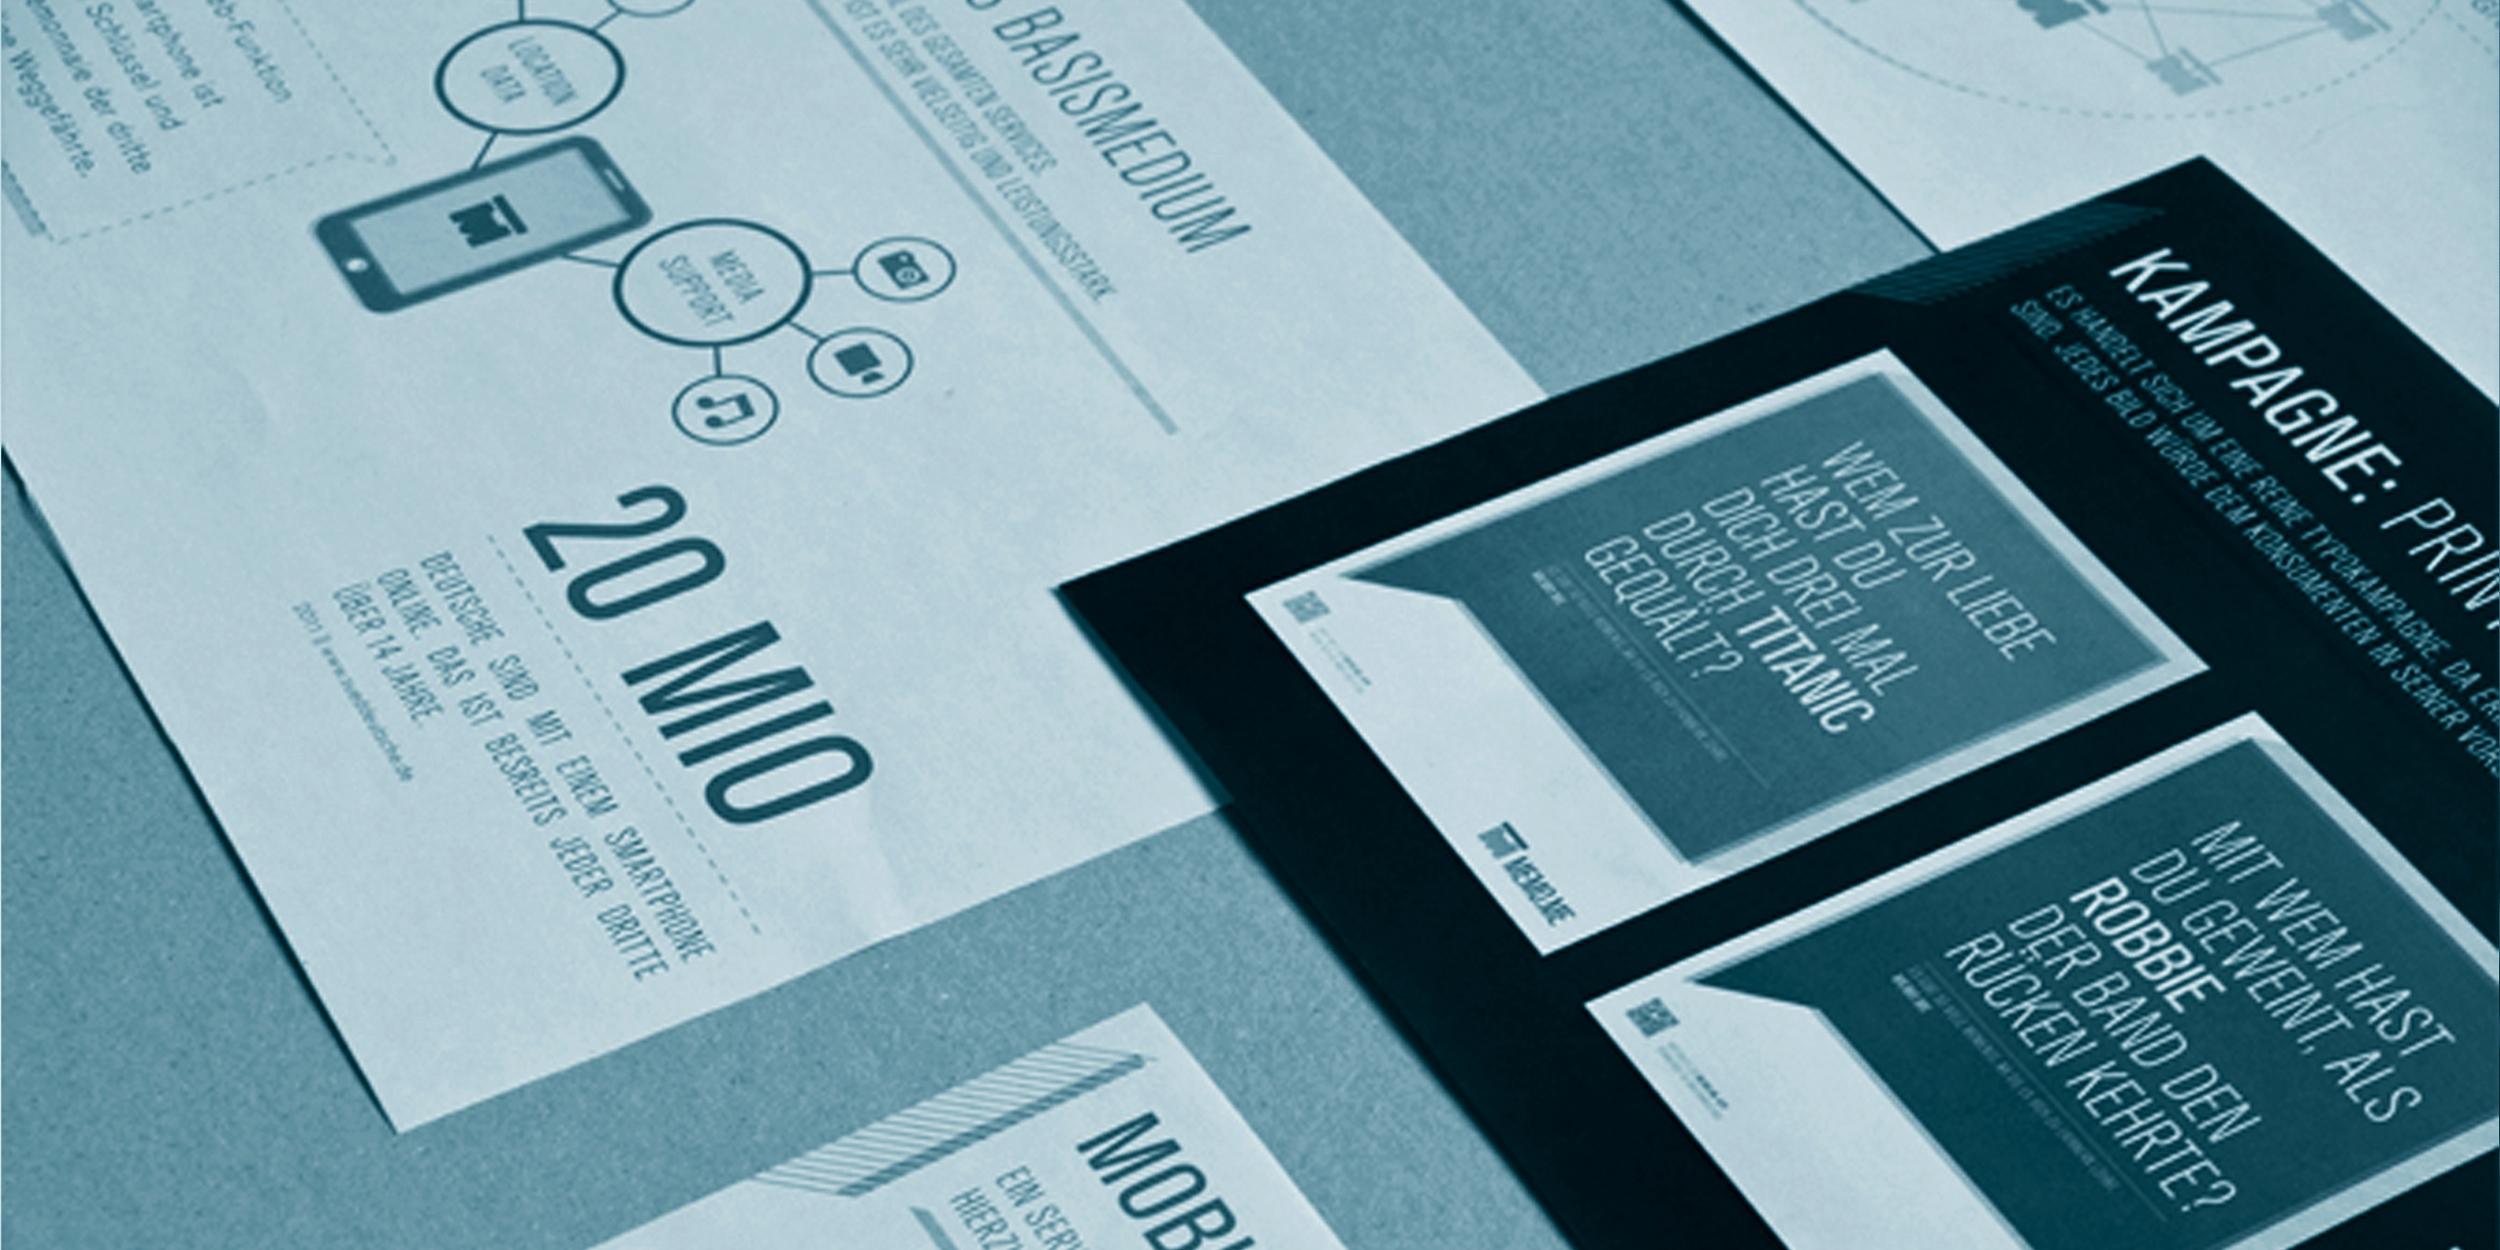 Visualisations & communication products